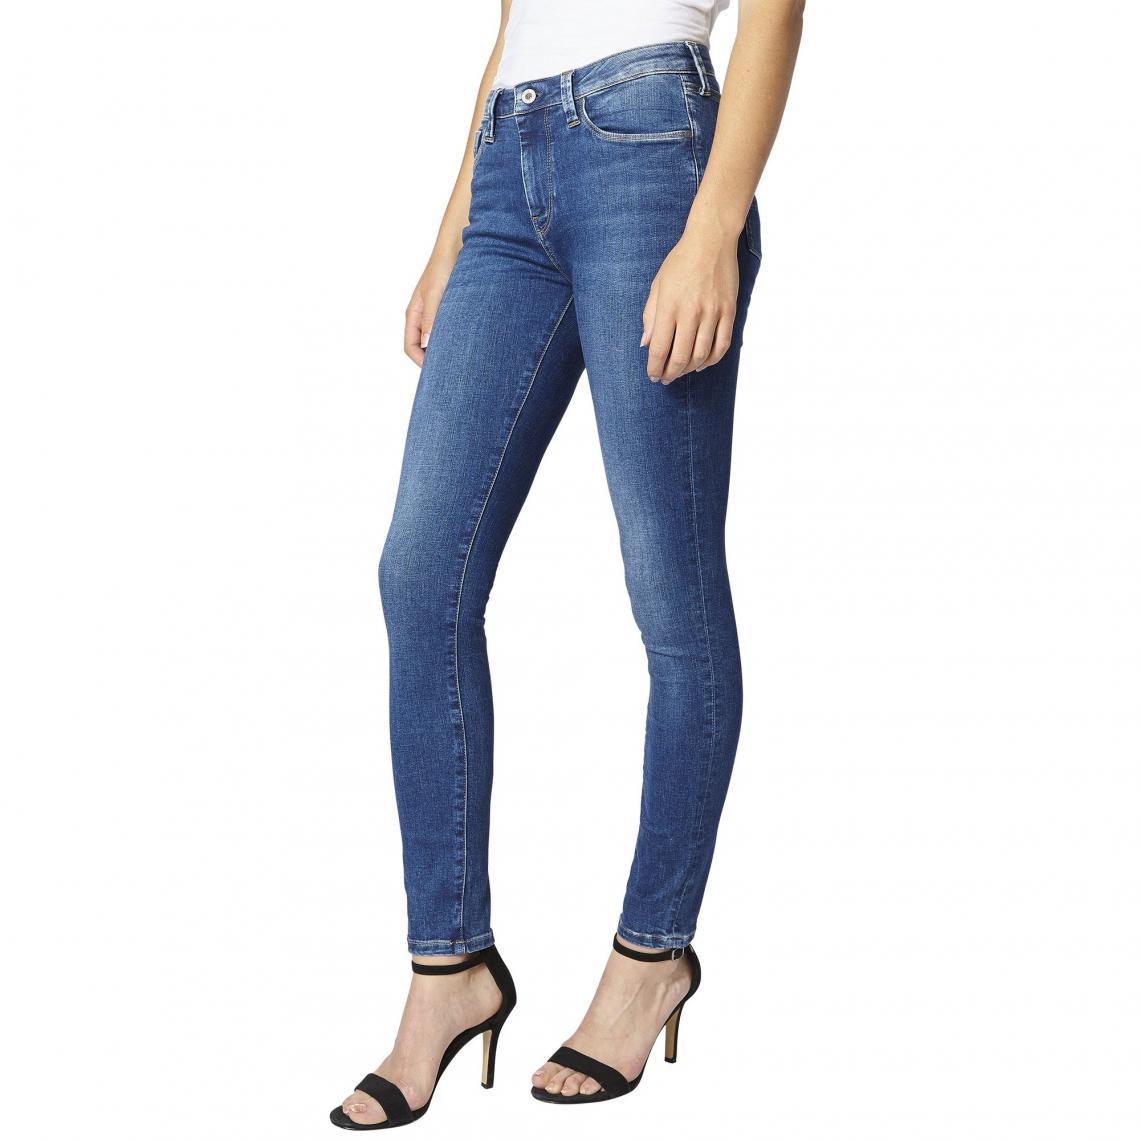 82939dd5396 Jean skinny L32 Regent Powerflex femme Pepe Jeans - Medium Used Pepe Jeans  Femme